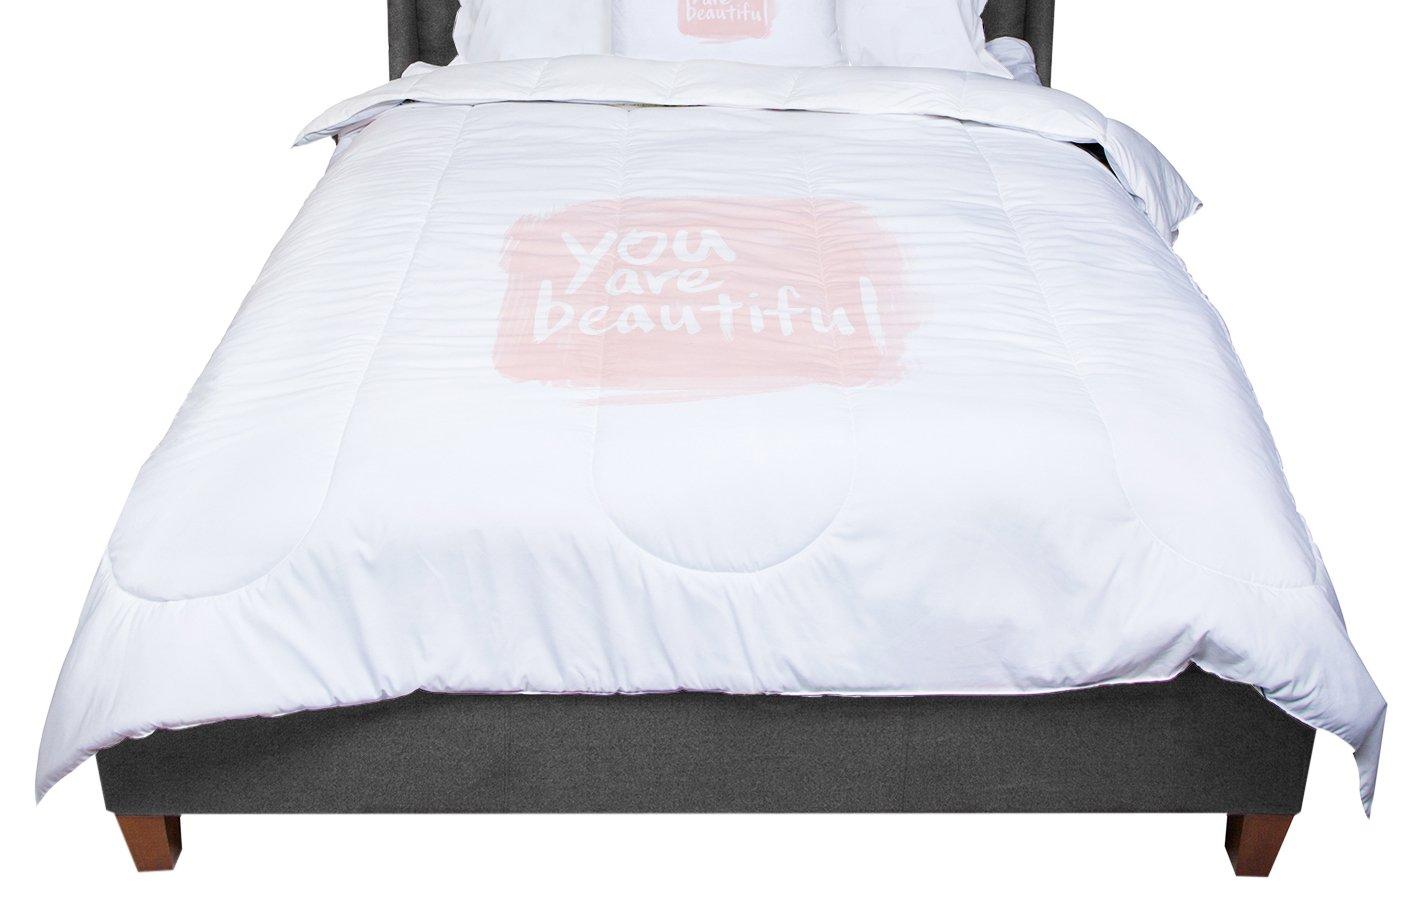 KESS InHouse Qing Ji Brush Lettering Beautiful Peach White Twin Comforter 68 X 88